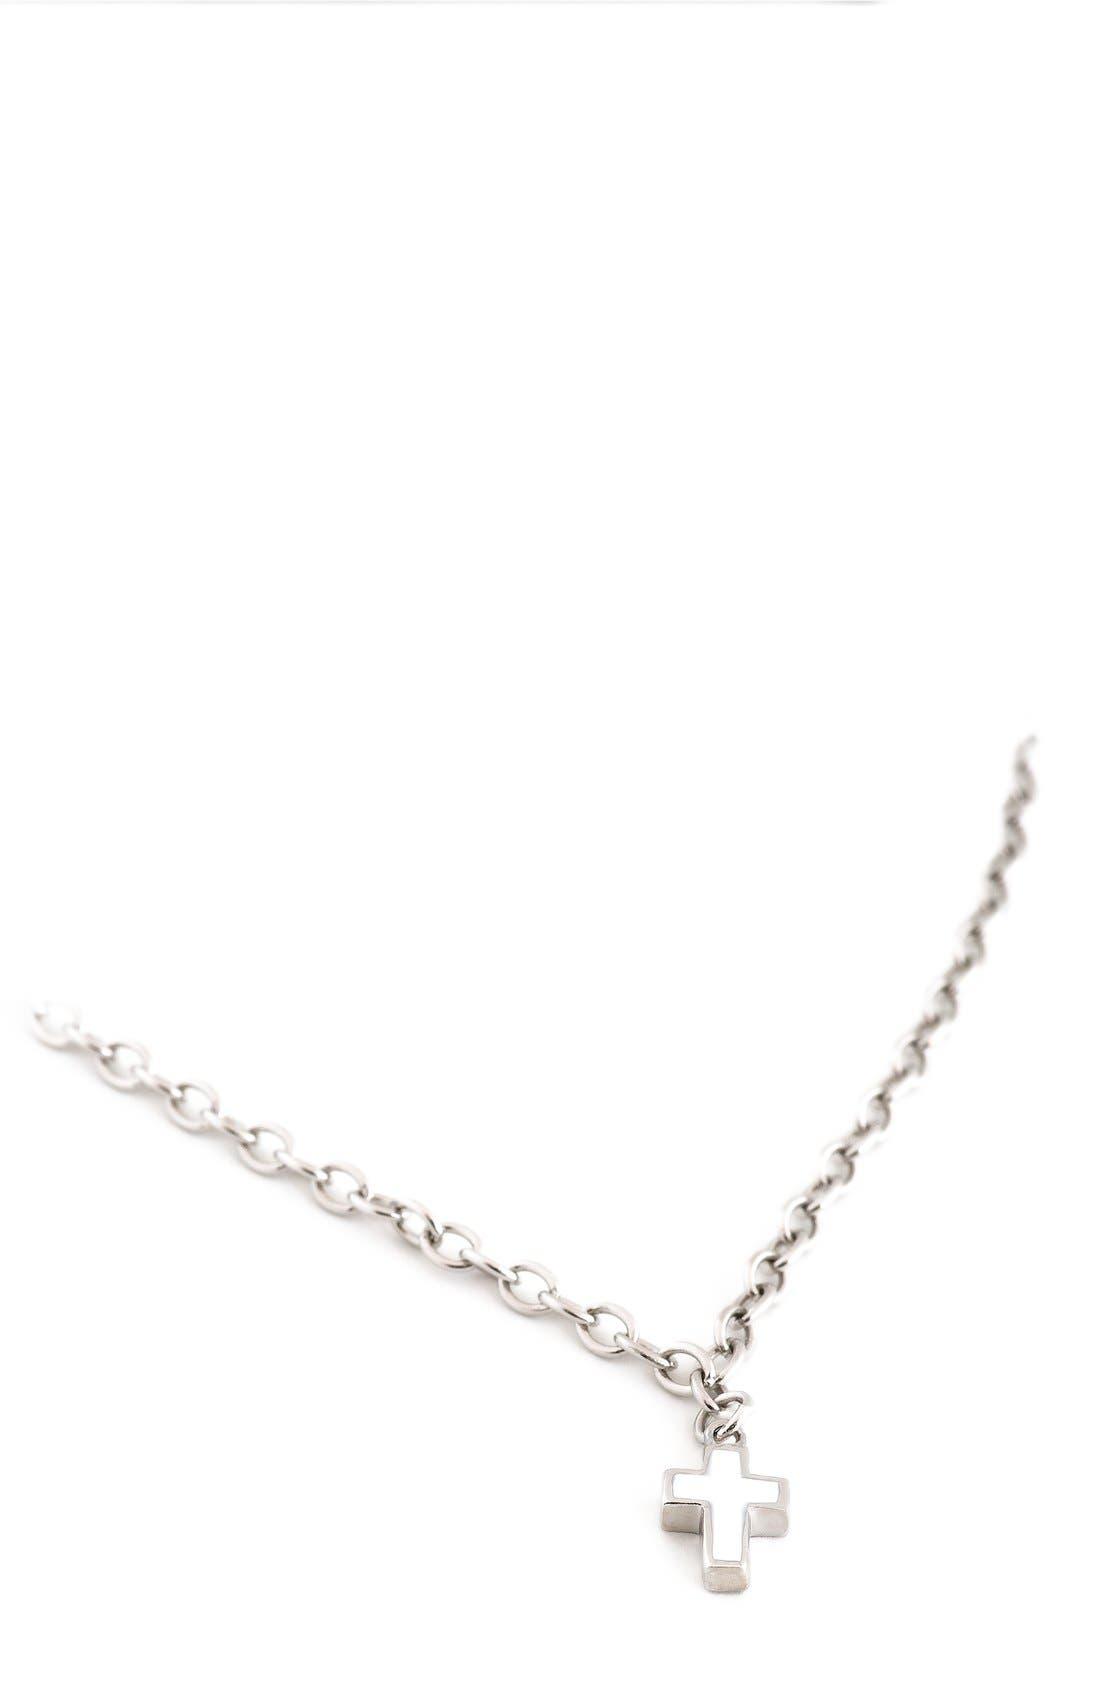 SPEIDEL Enameled Cross Sterling Silver Pendant Necklace